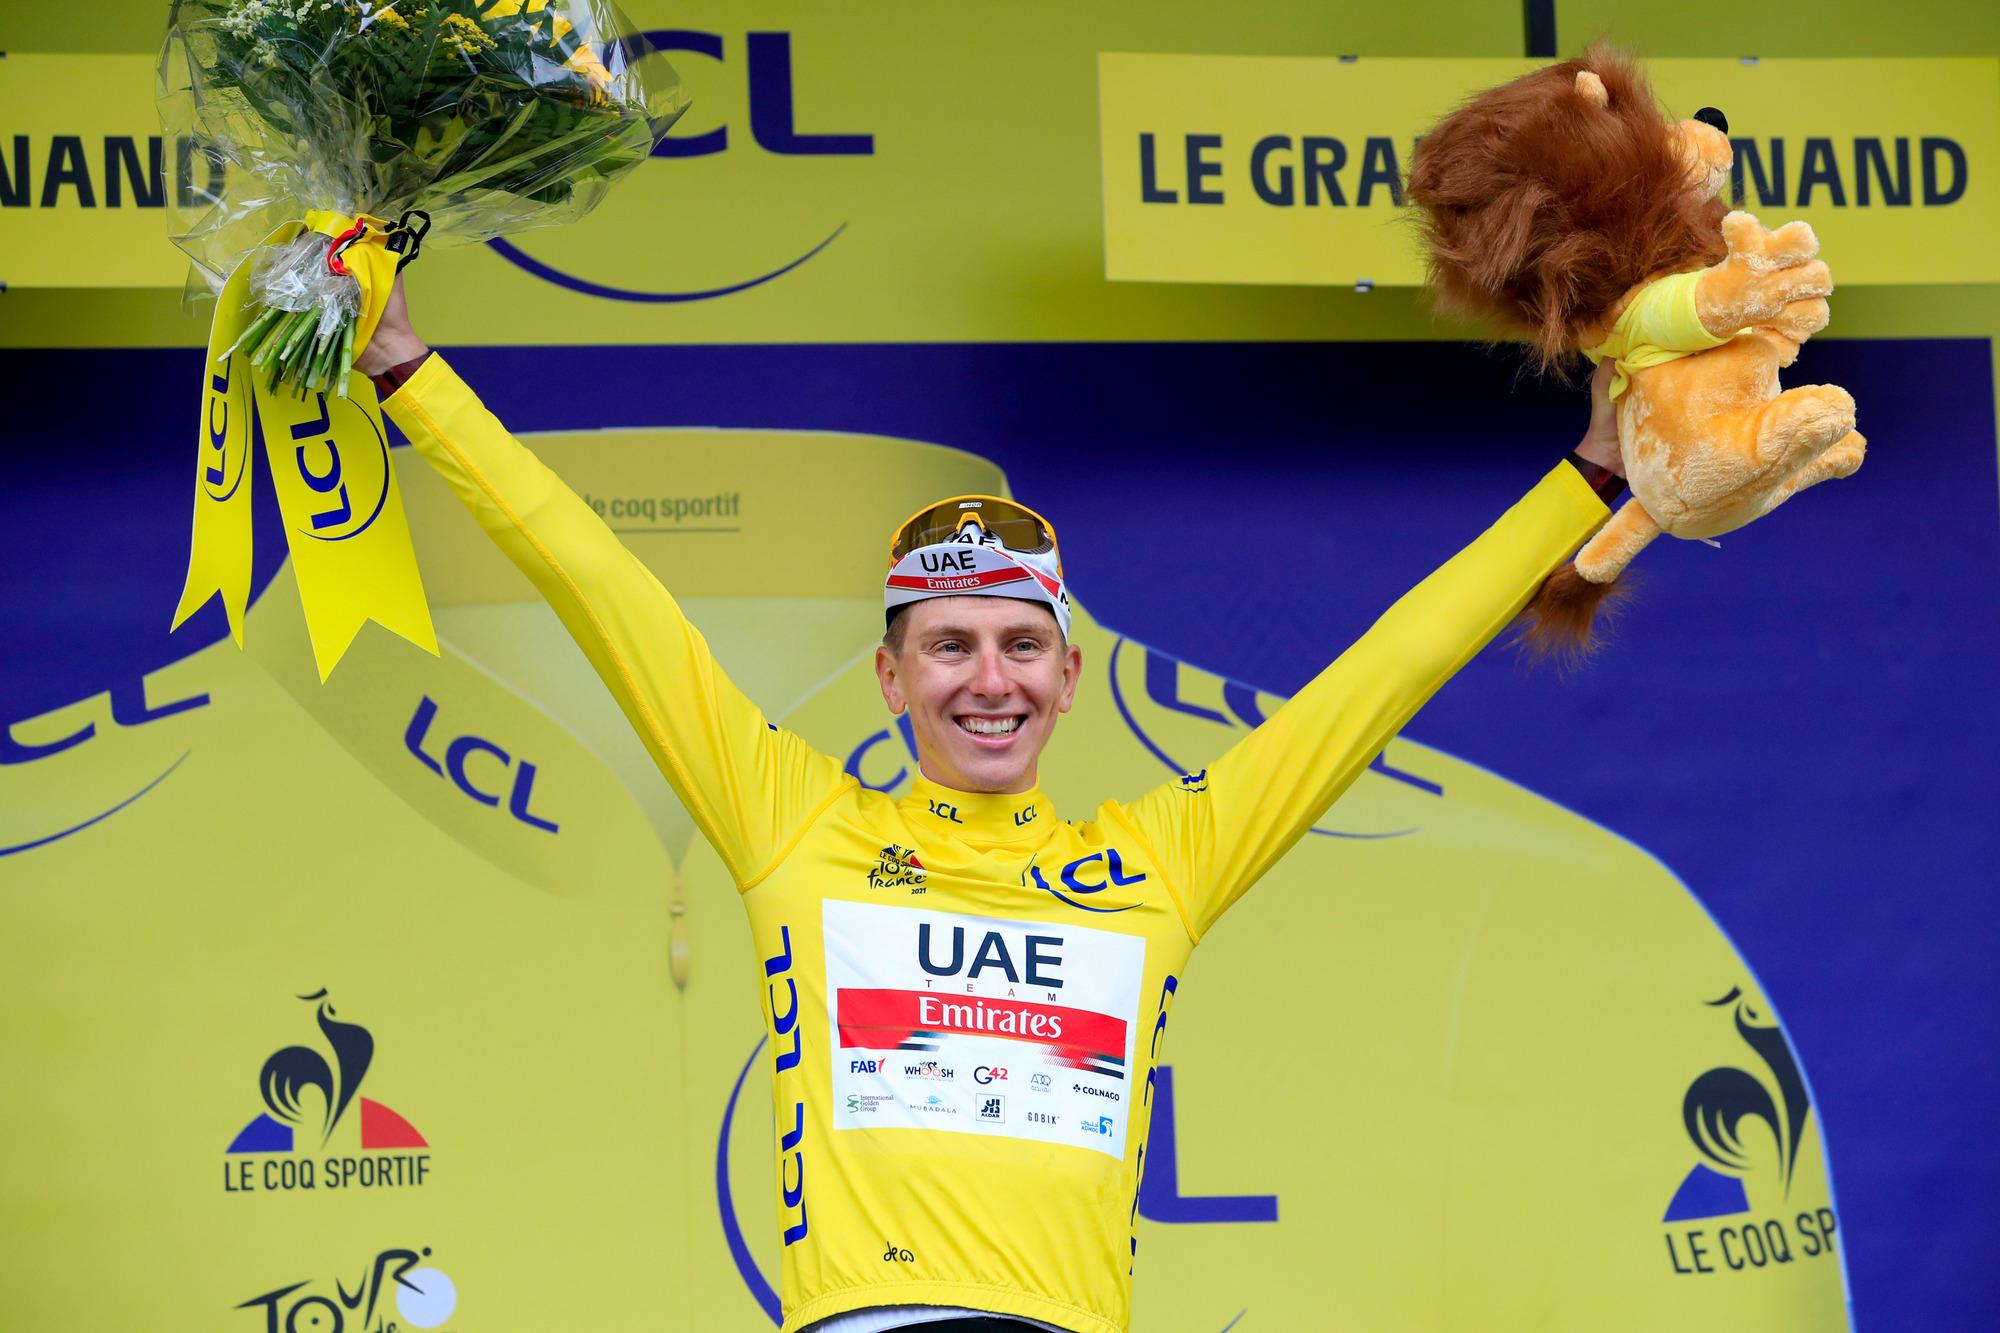 Tour de France 2021 108th Edition 8th stage Oyonnax Le GrandBornand 1508 km 03072021 Tadej Pogacar SLO UAE Team Emirates photo Luca BettiniBettiniPhoto2021